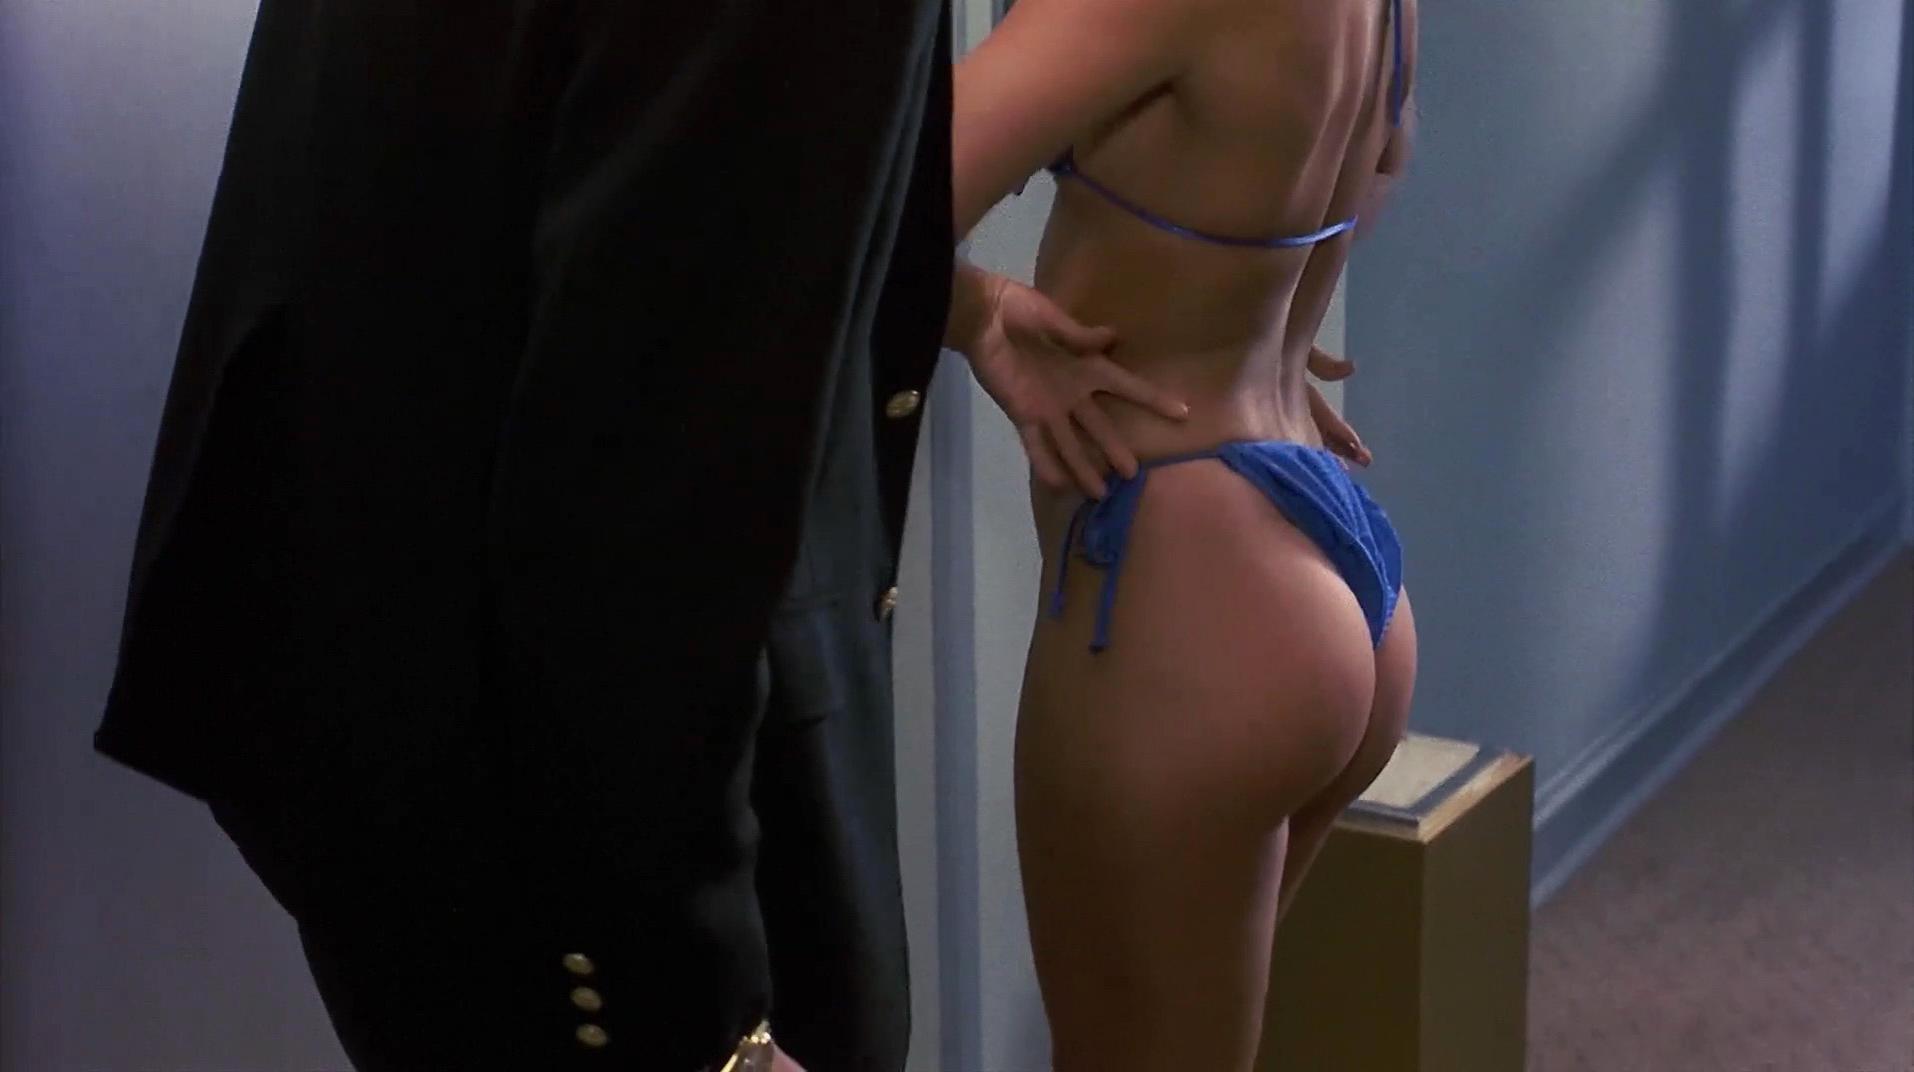 private resort movie nudity